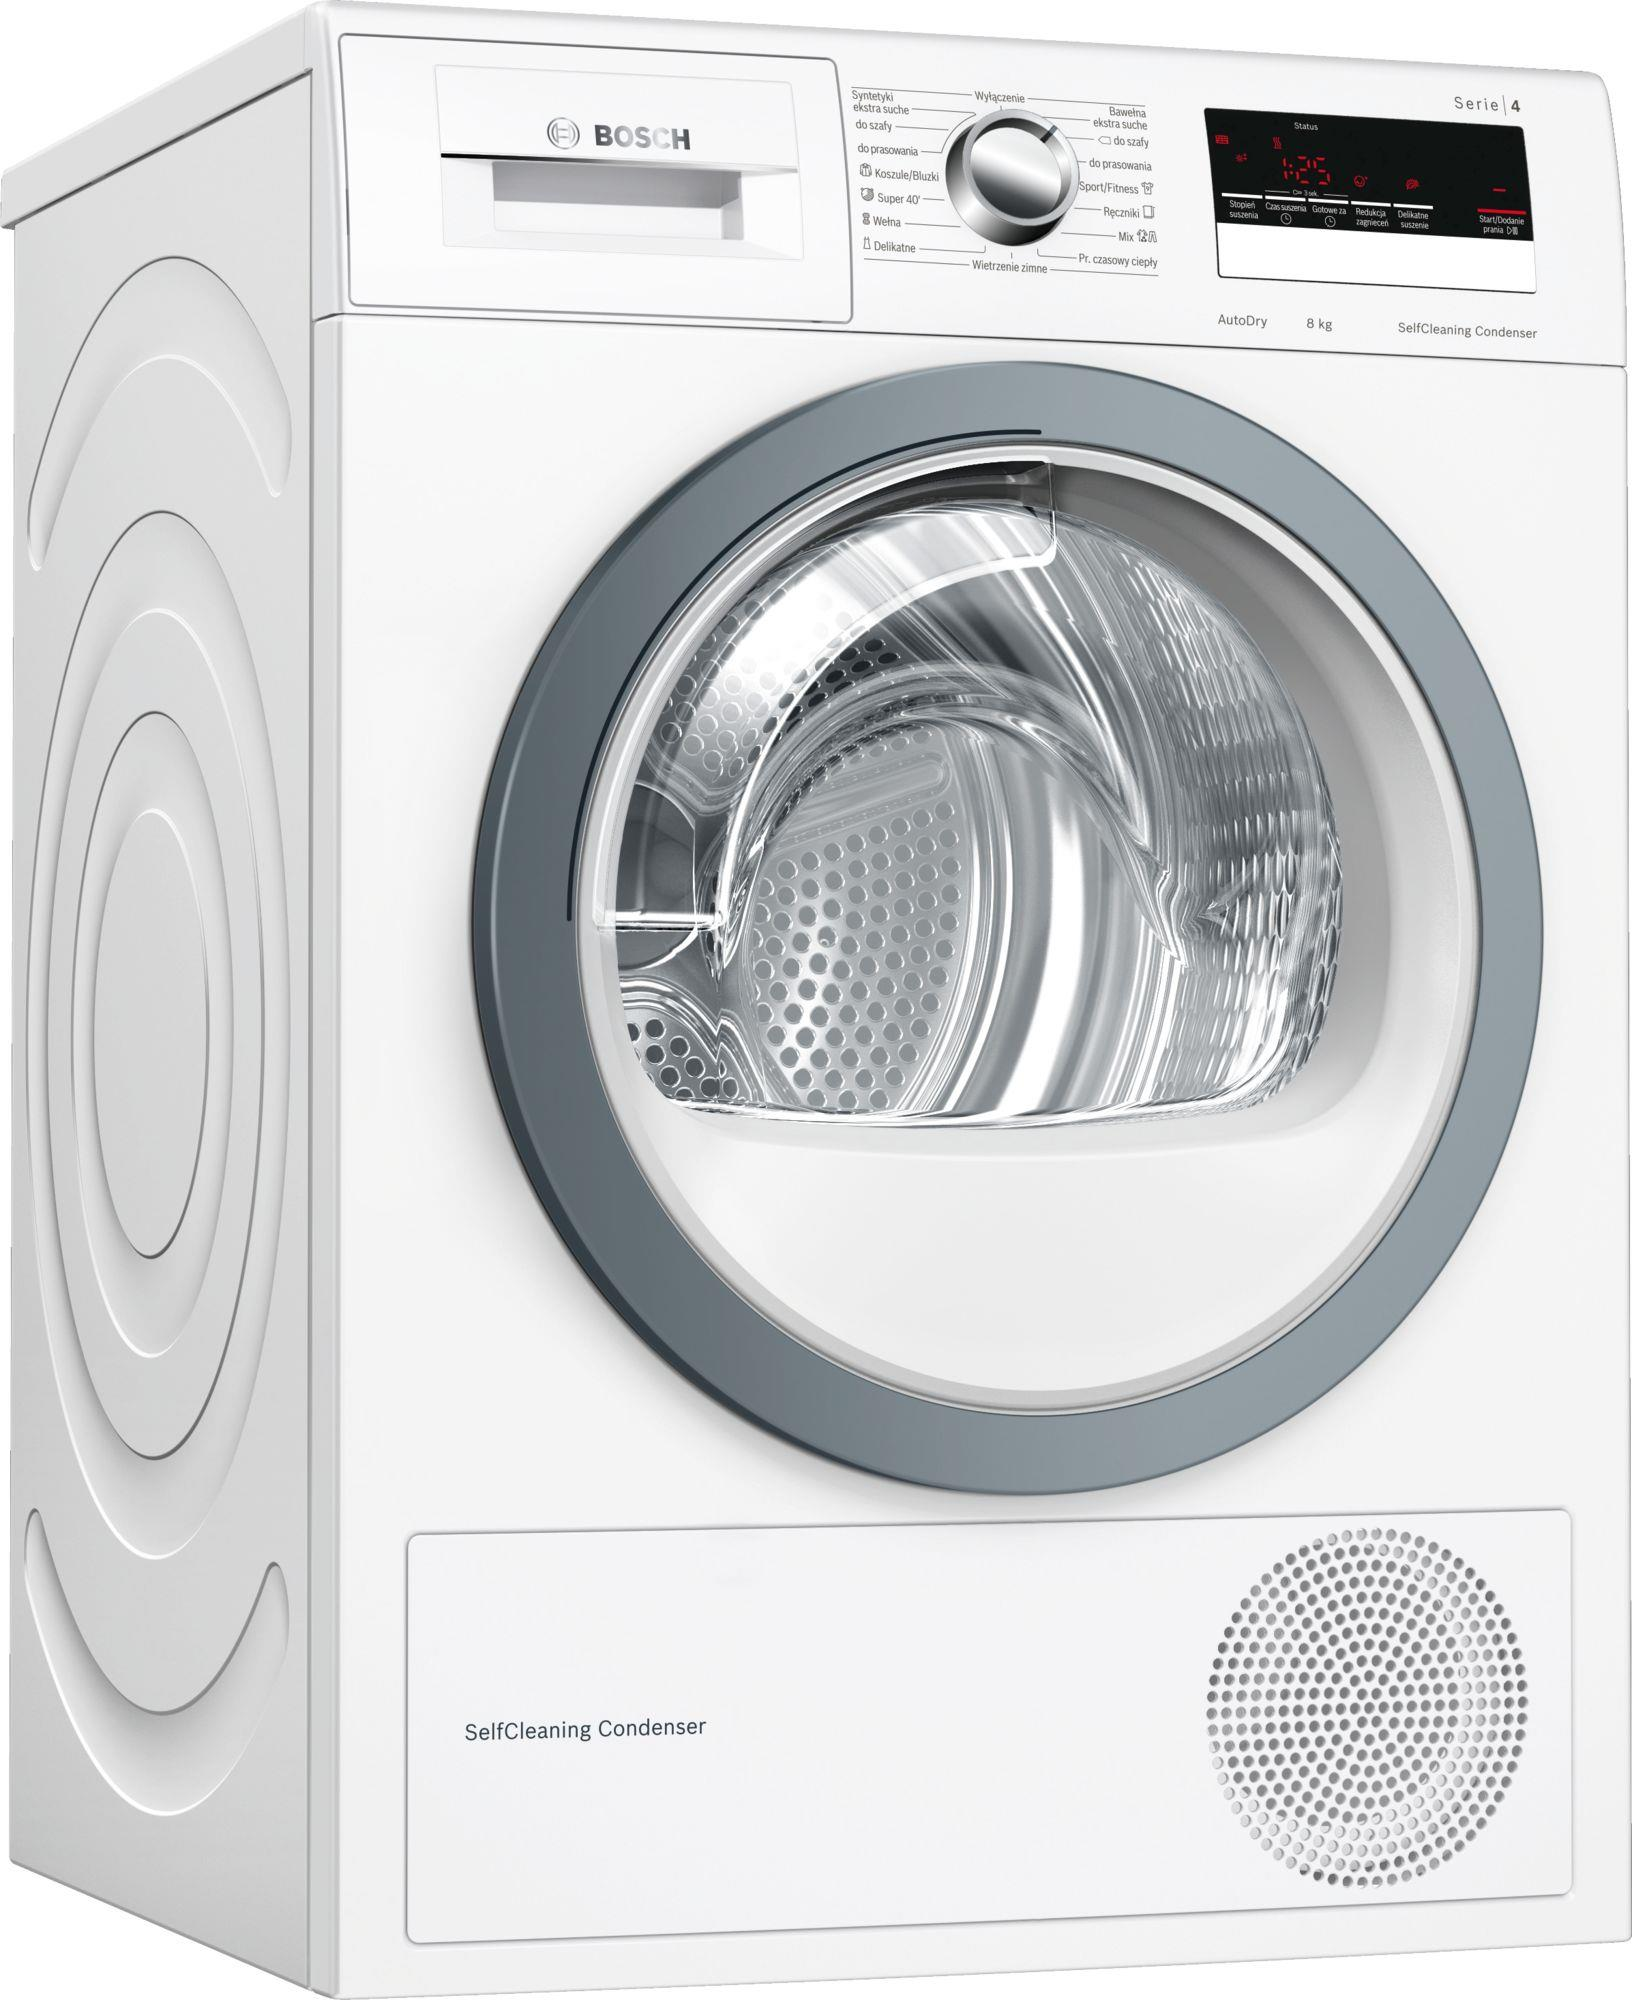 Dryer    BOSCH  WTM8528KPL (8 kg; 599 mm) WTM8528KPL Veļas žāvētājs